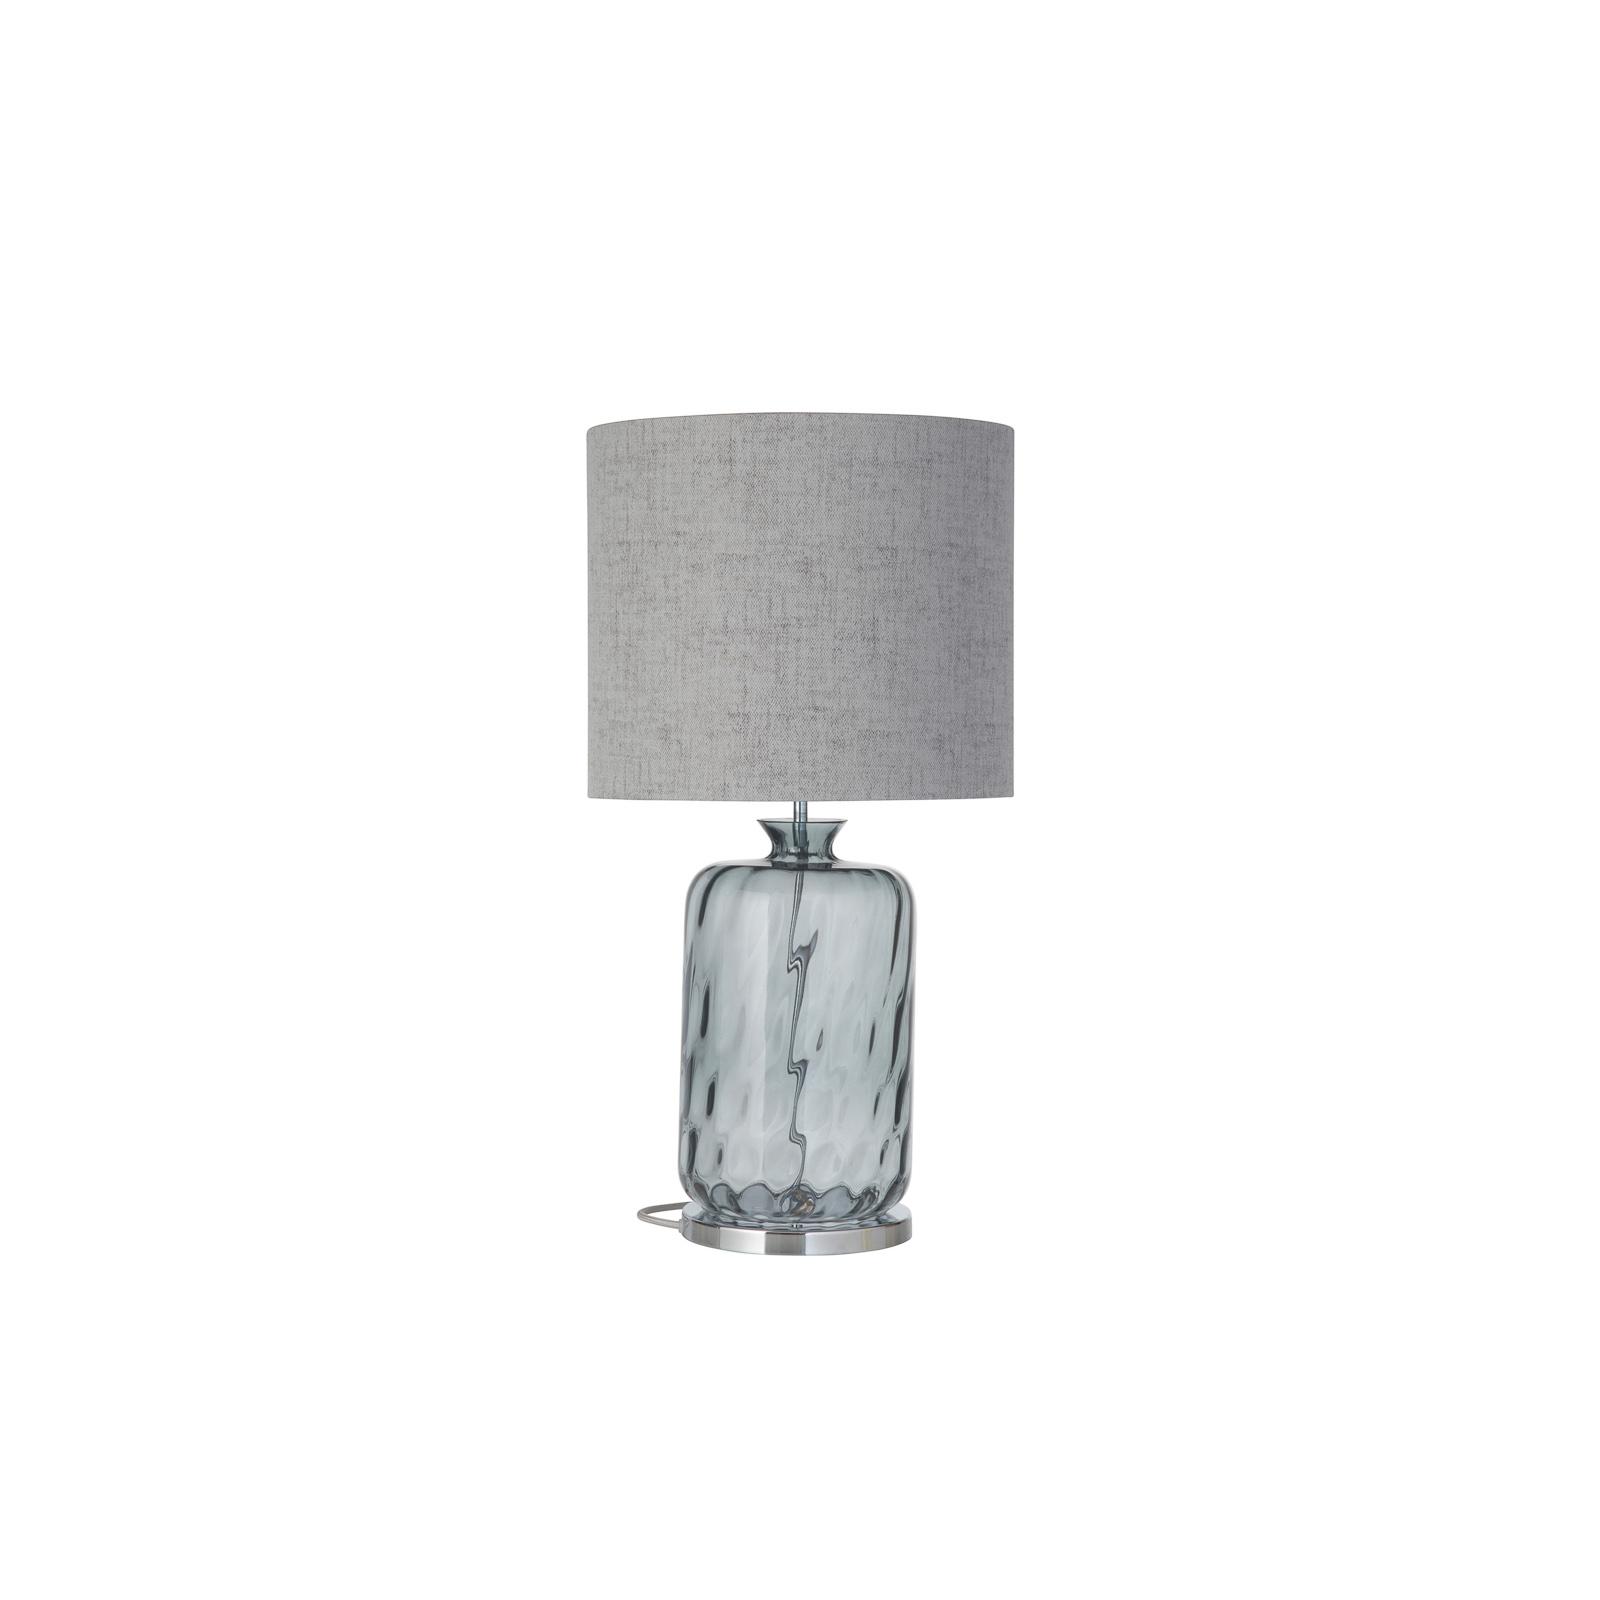 EBB & FLOW Pillar lampe à poser, grey/gris fumé